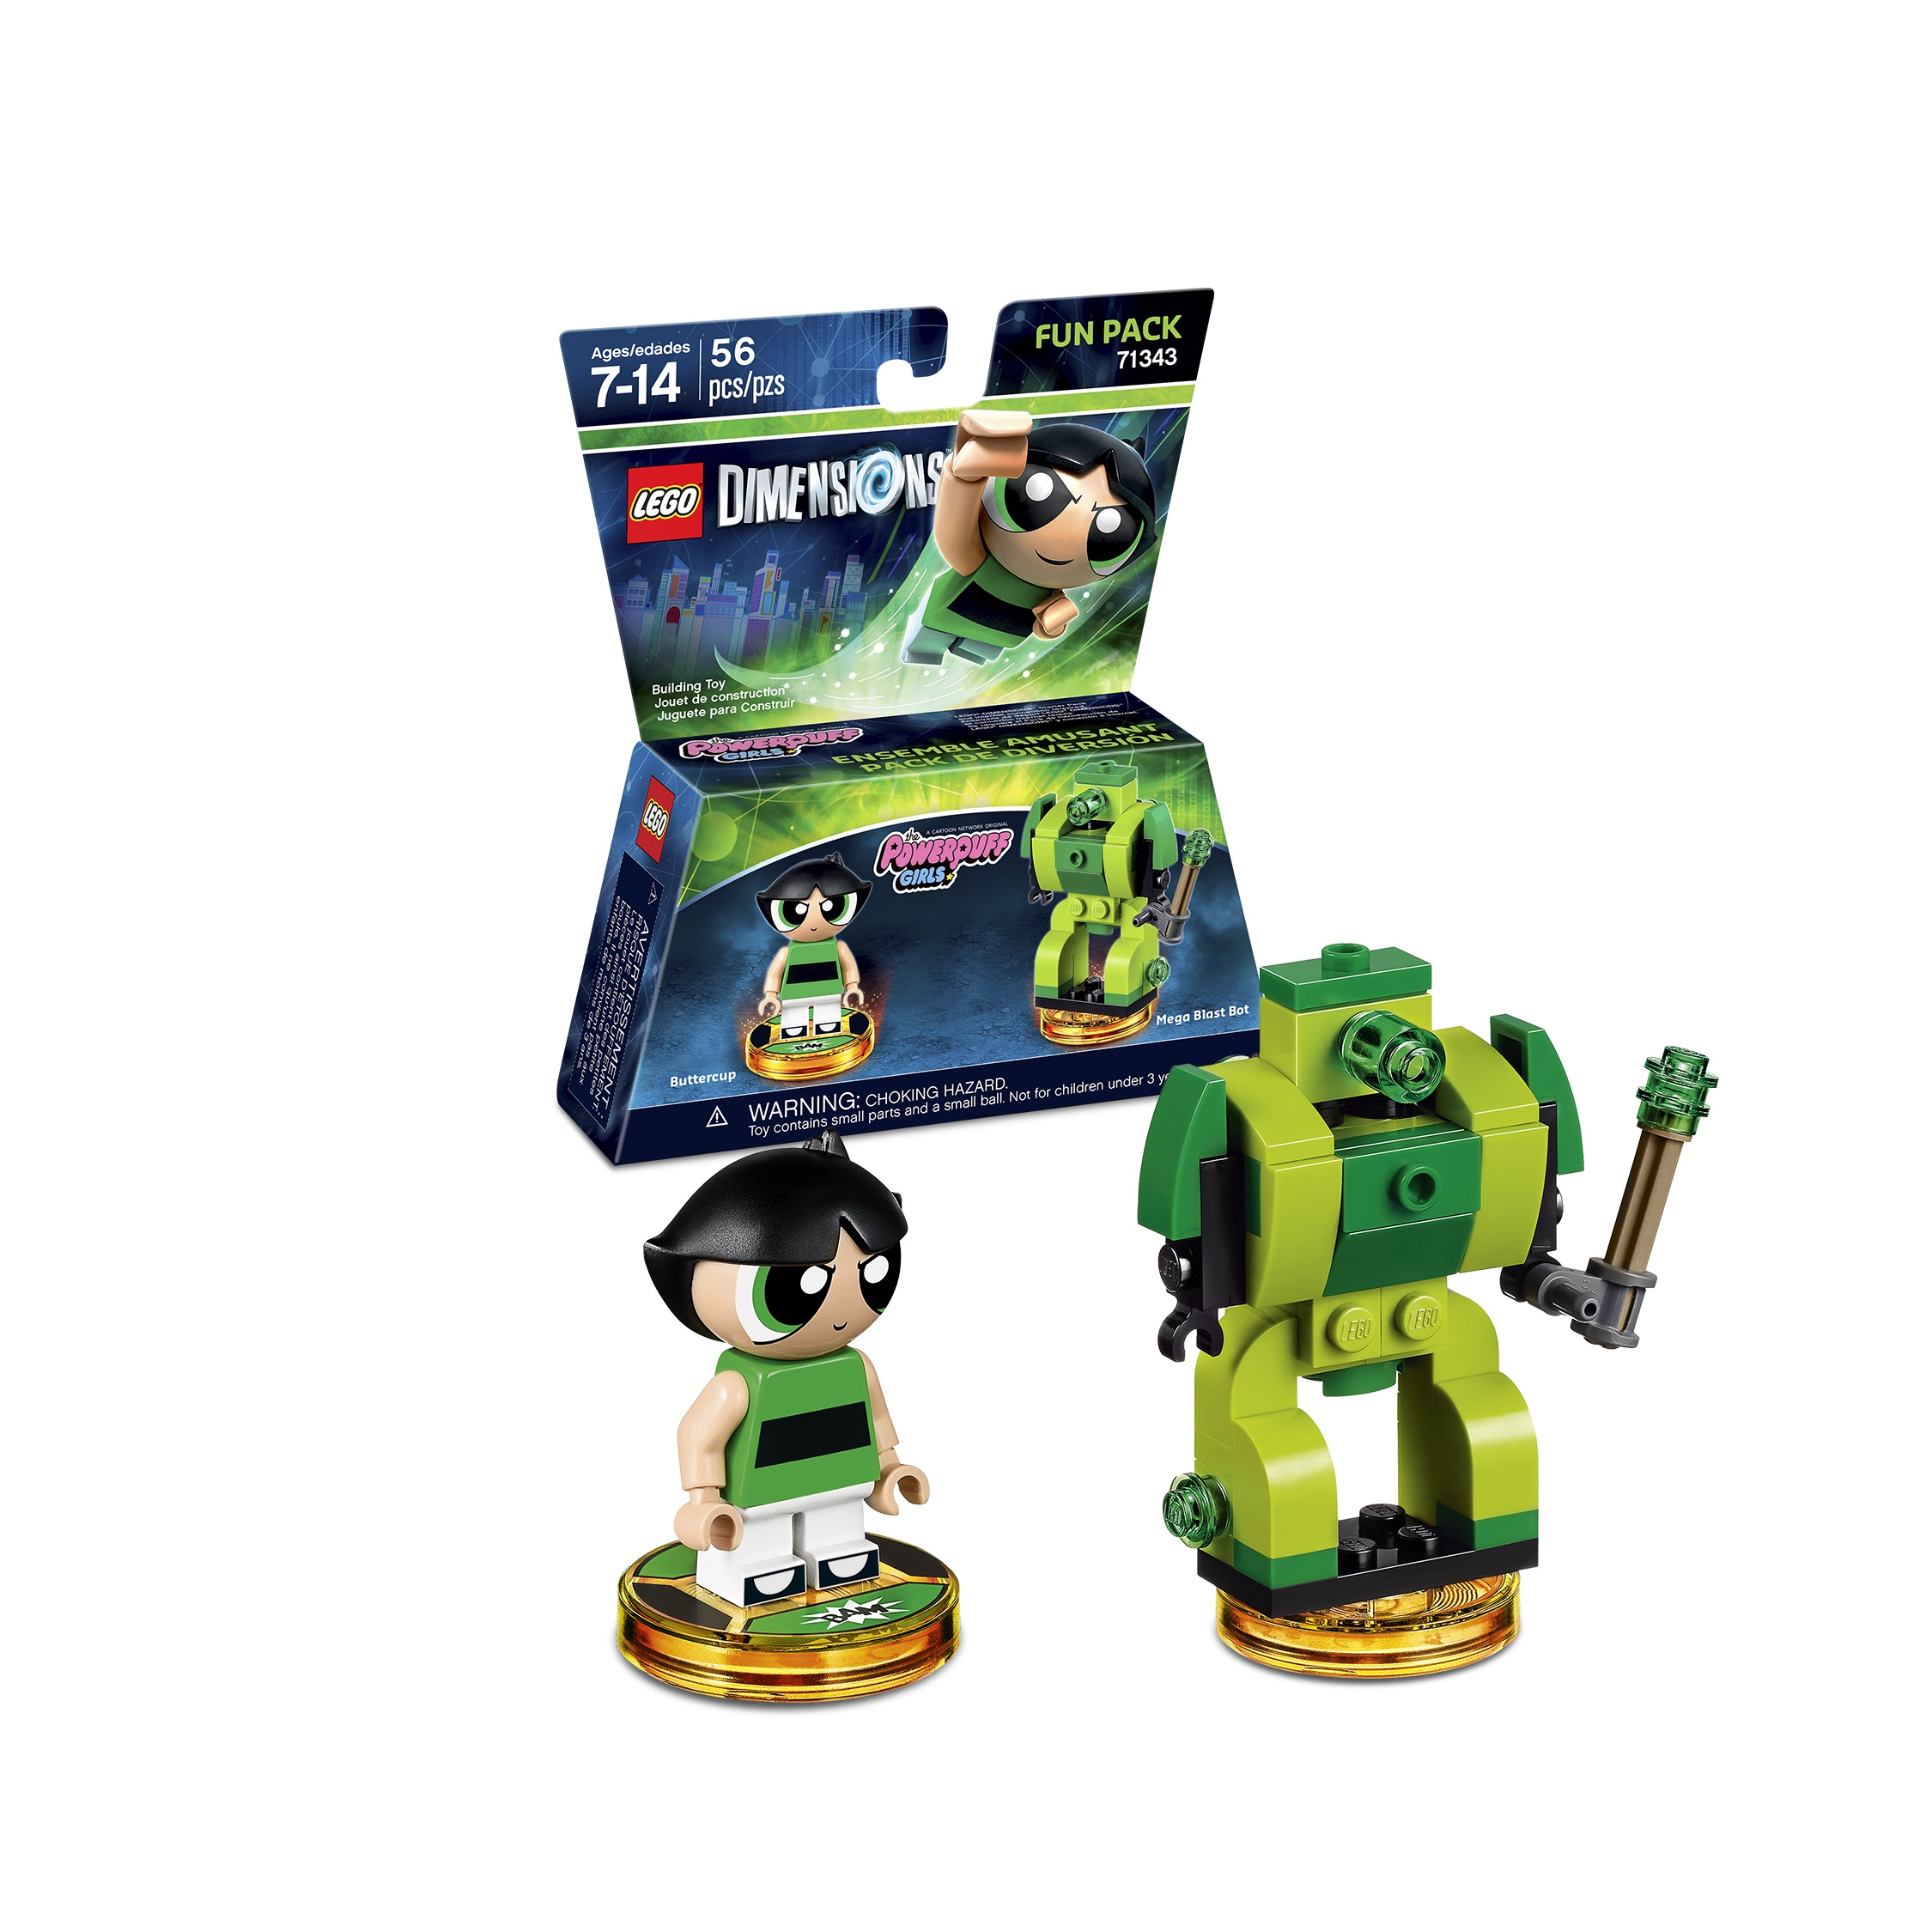 LEGO Dimensions - The Powerpuff Girls Fun Pack